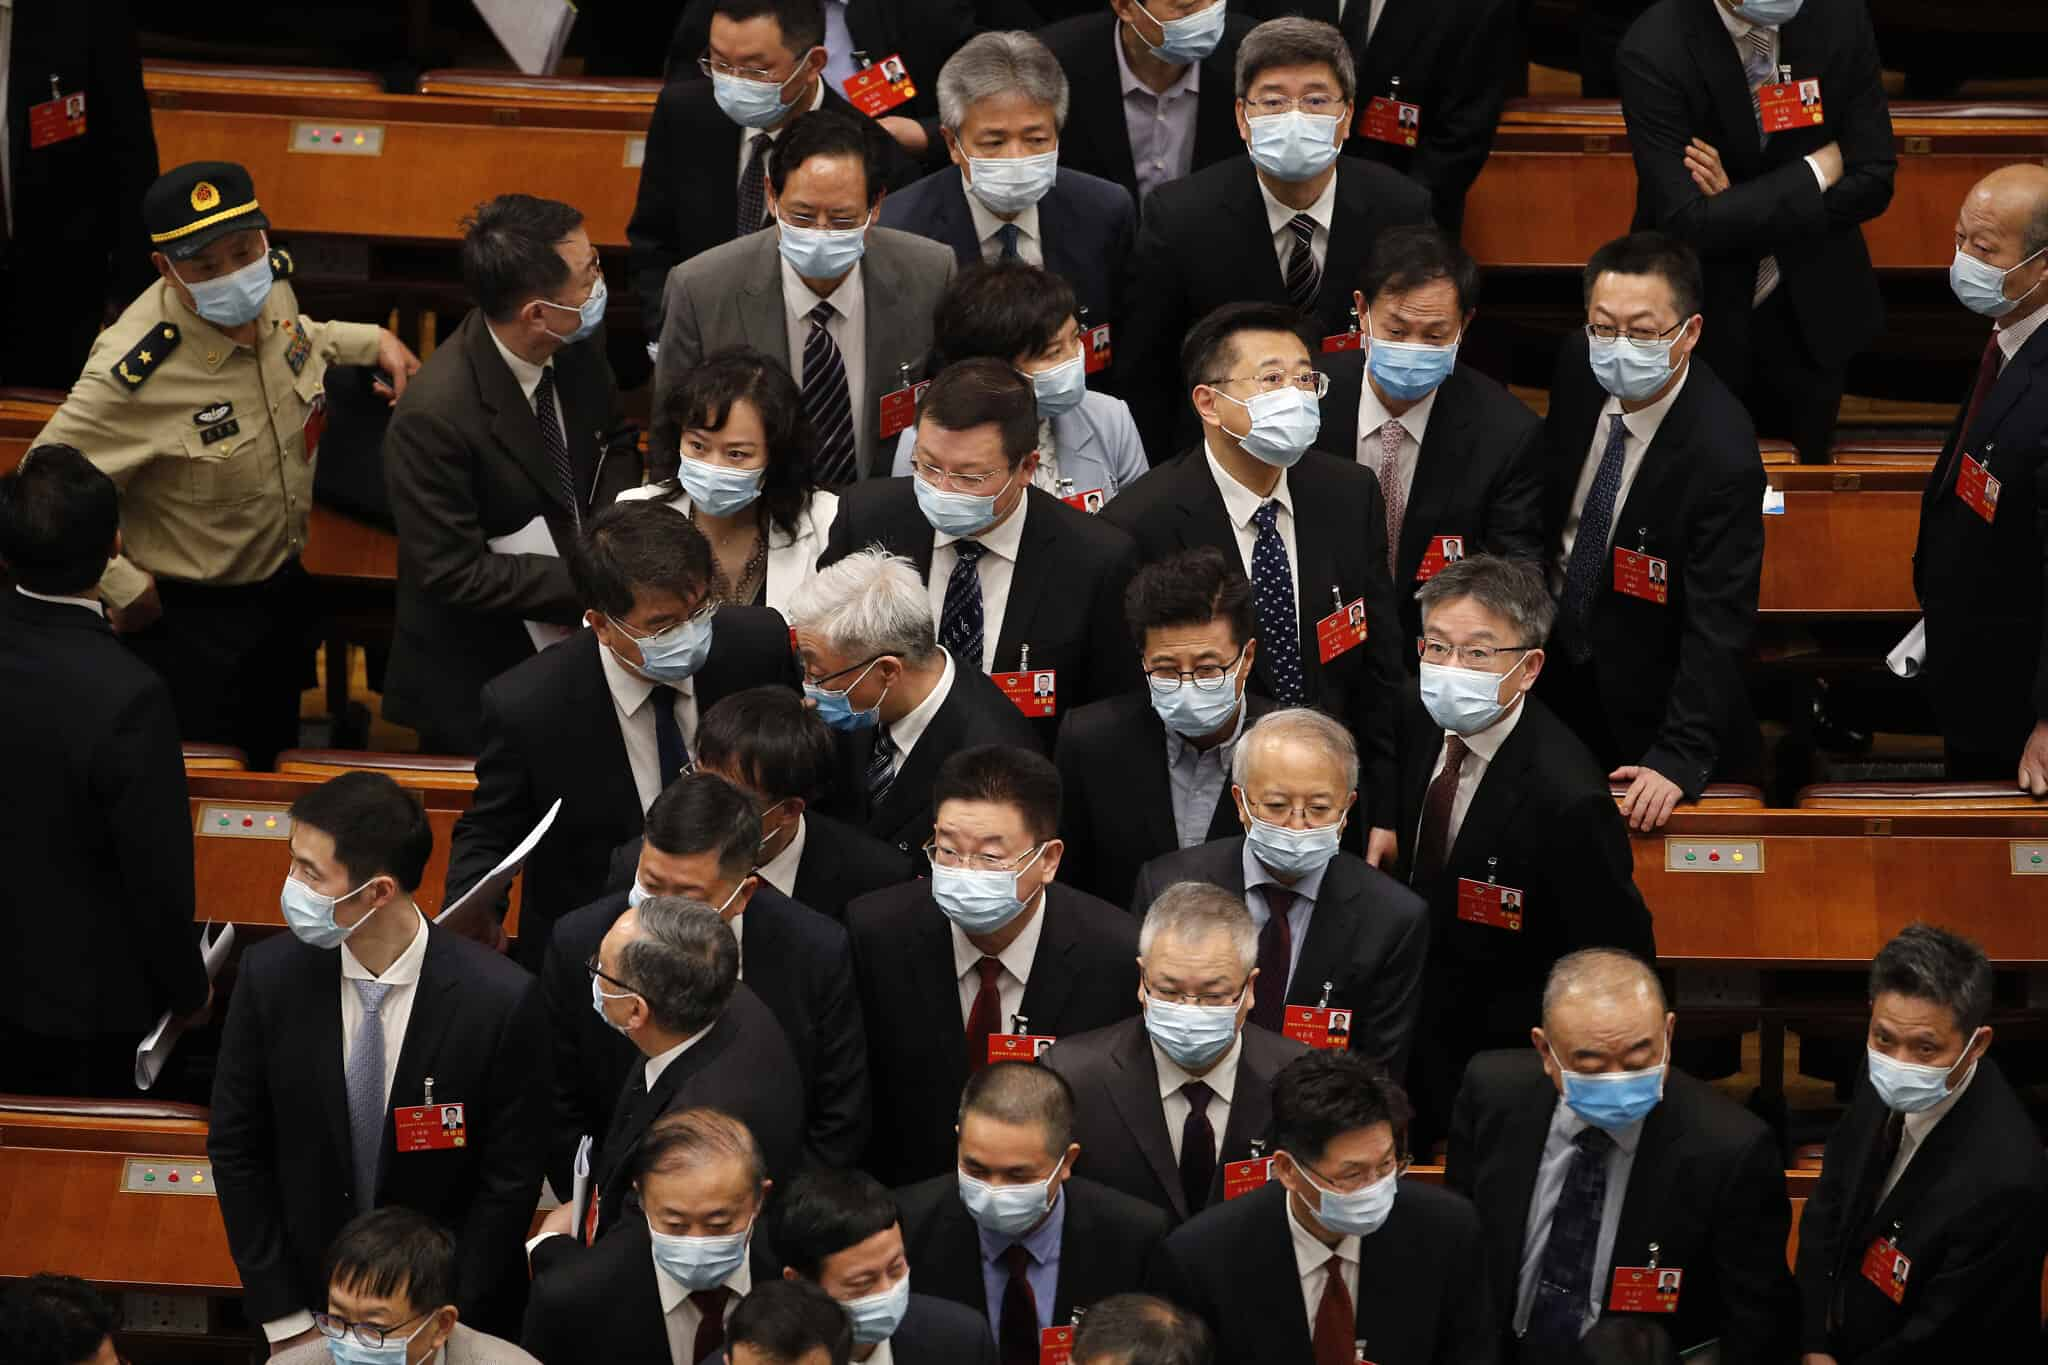 אילוסטרציה, דיון פוליטי בסין בעידן הקורונה, מאי 2020 (צילום: AP Photo/Andy Wong, Pool)